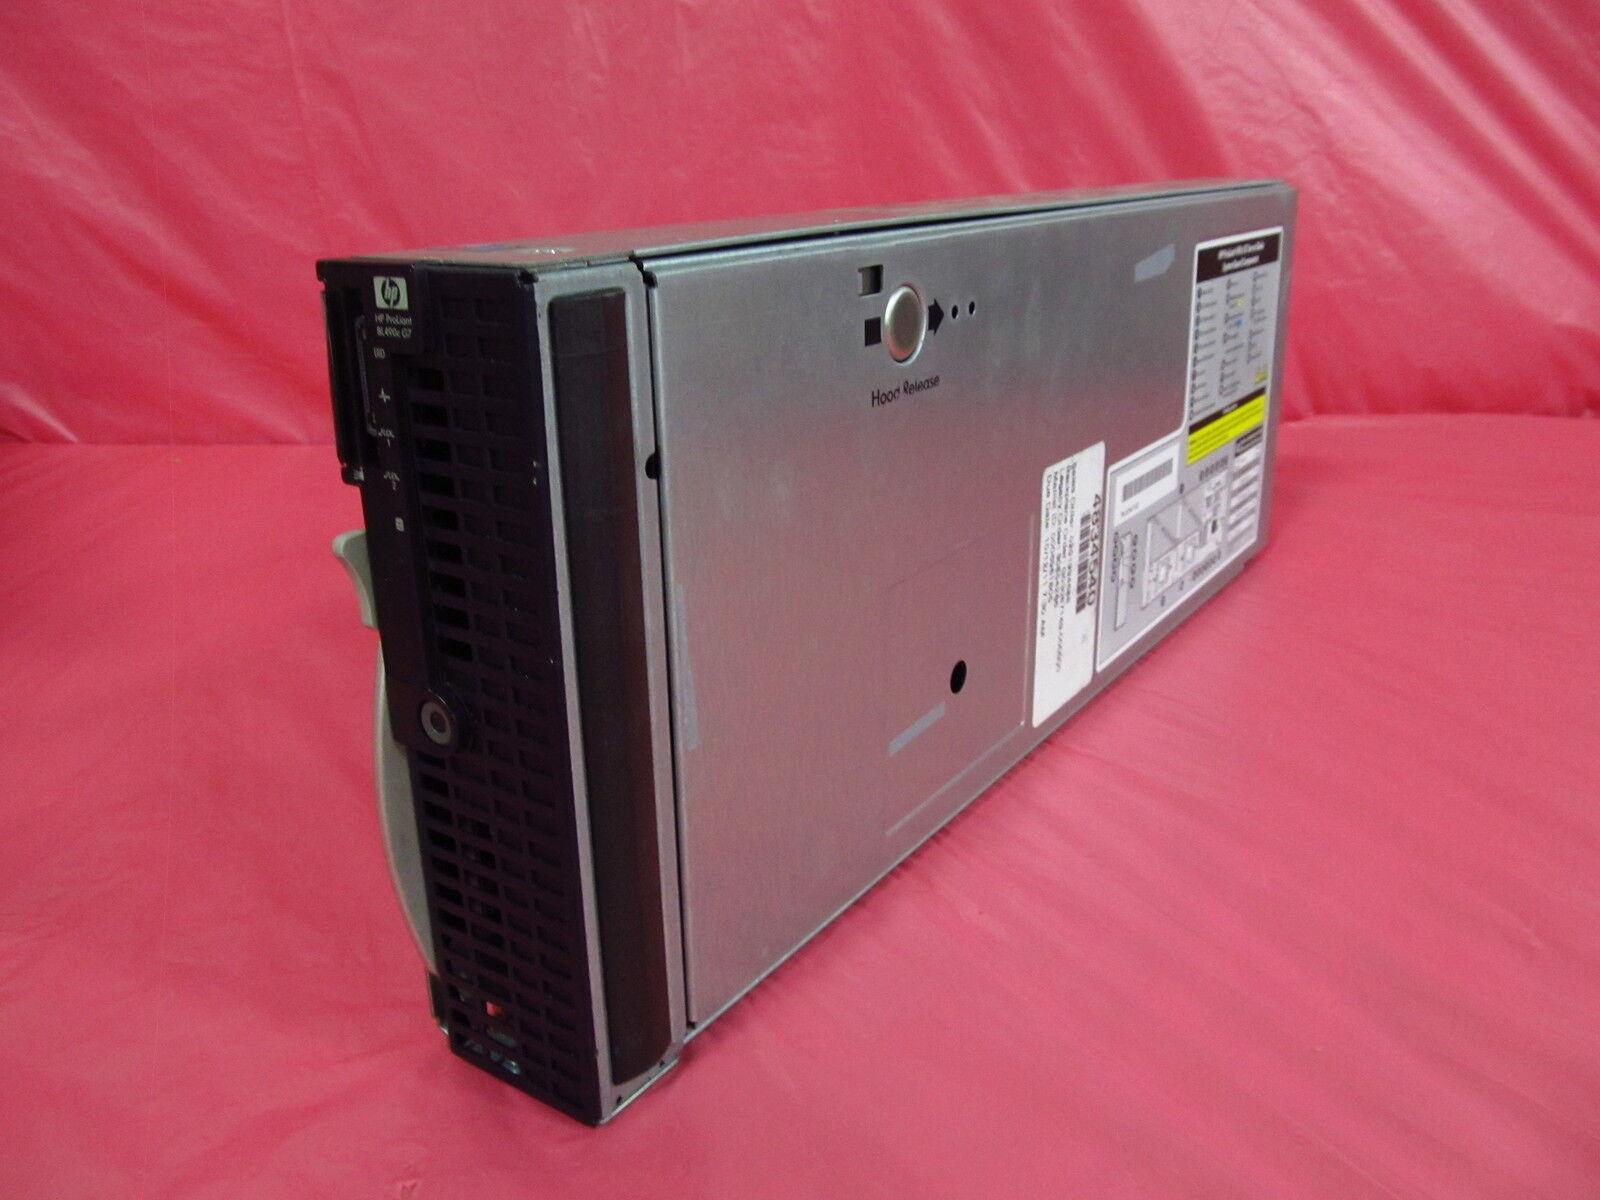 No CPU NO MEMORY BL490C G7 CTO 603719-B21 INCLUDES 2 HEATINKS